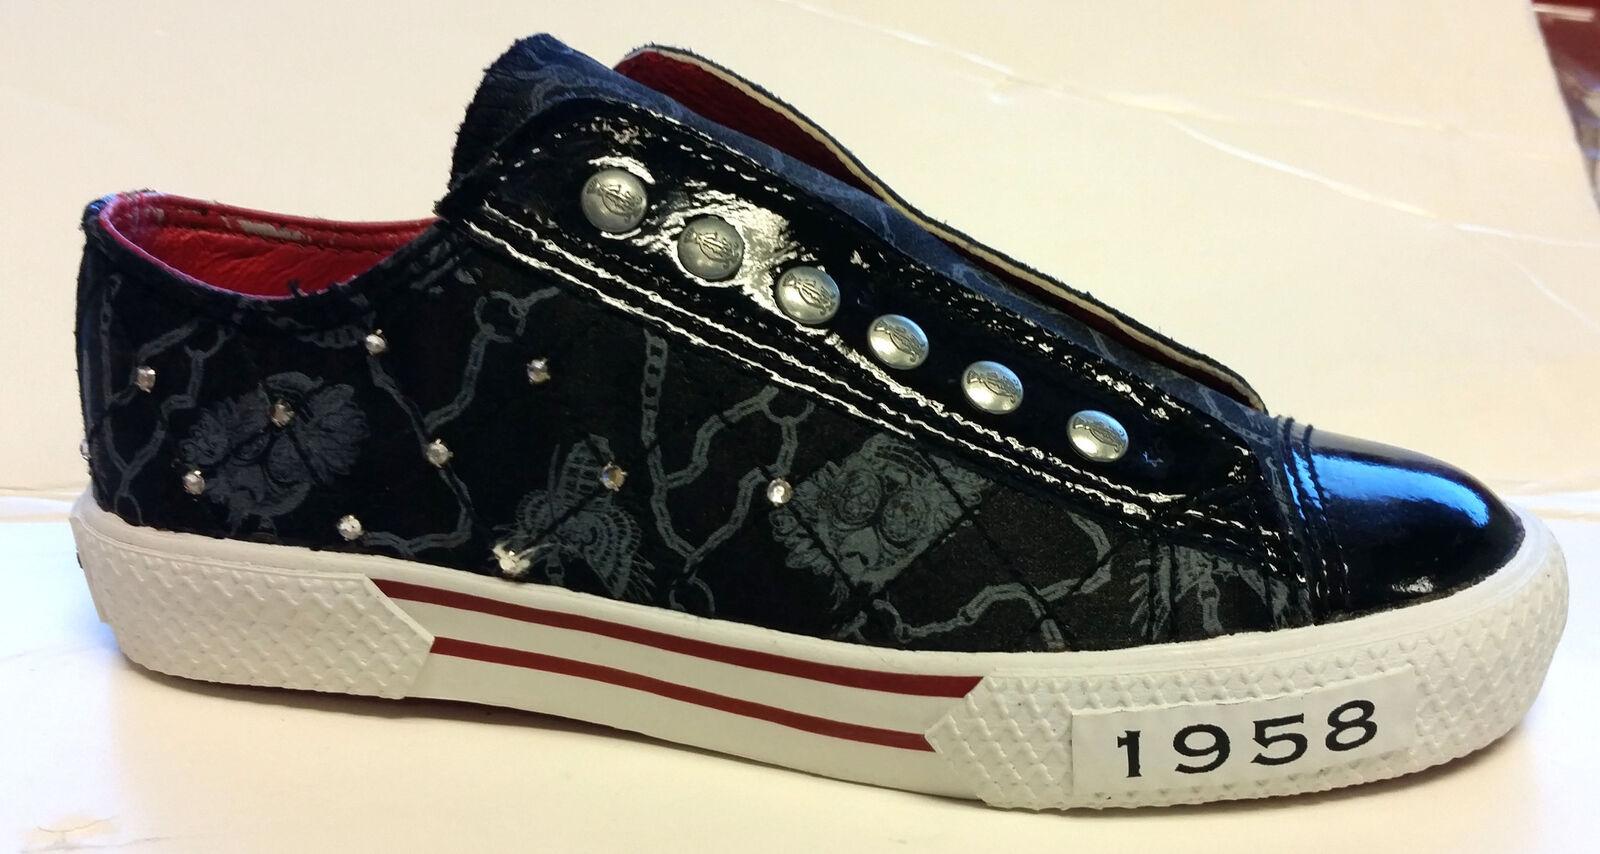 Wouomo Christian Audigier ED HARDY Satin Quilt Rhinestone scarpe nero